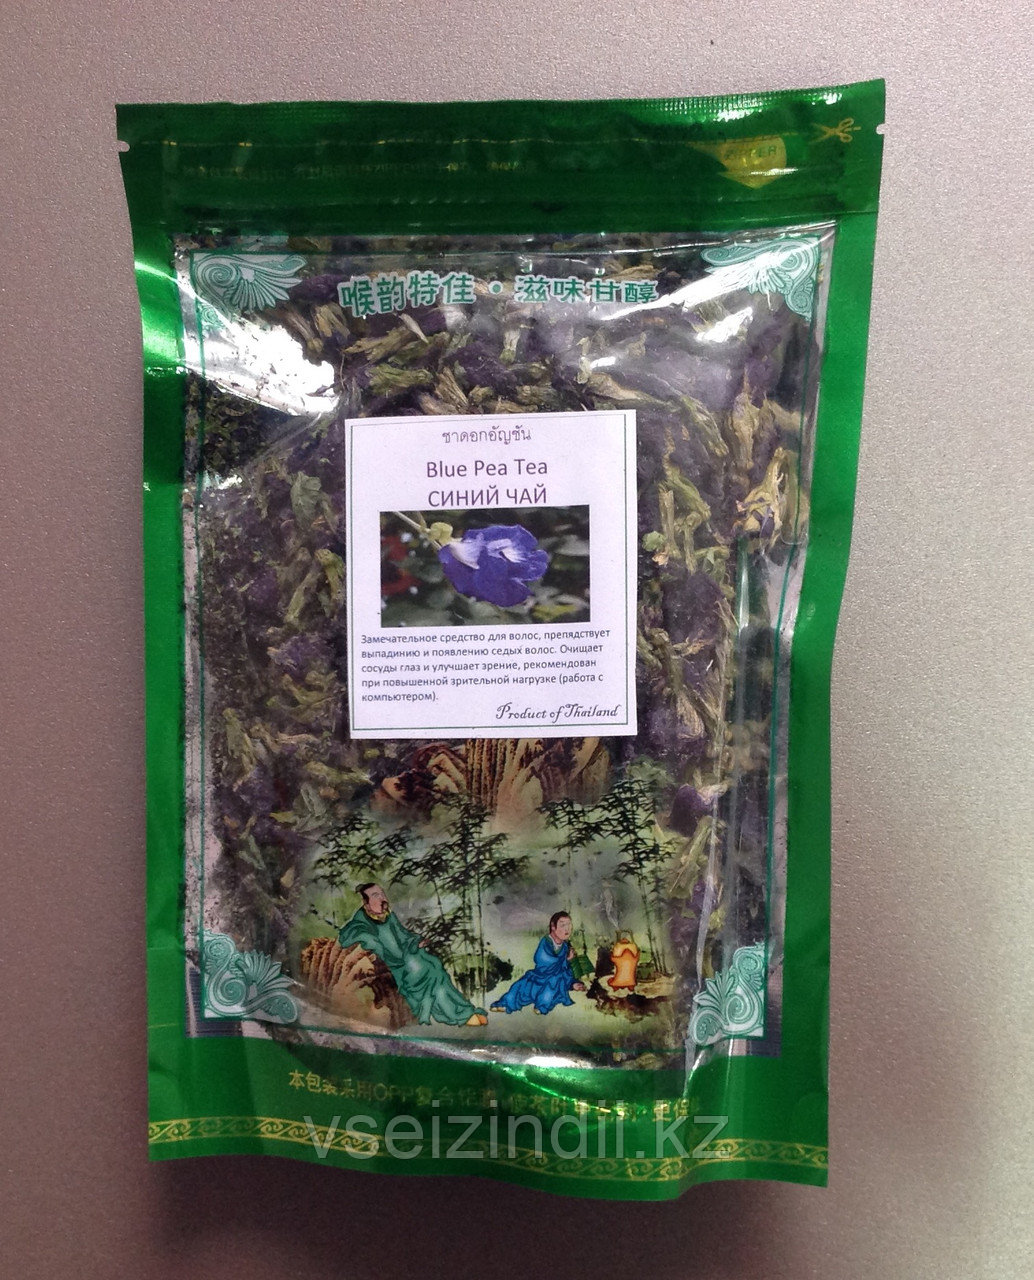 Синий чай из клитории 50 гр